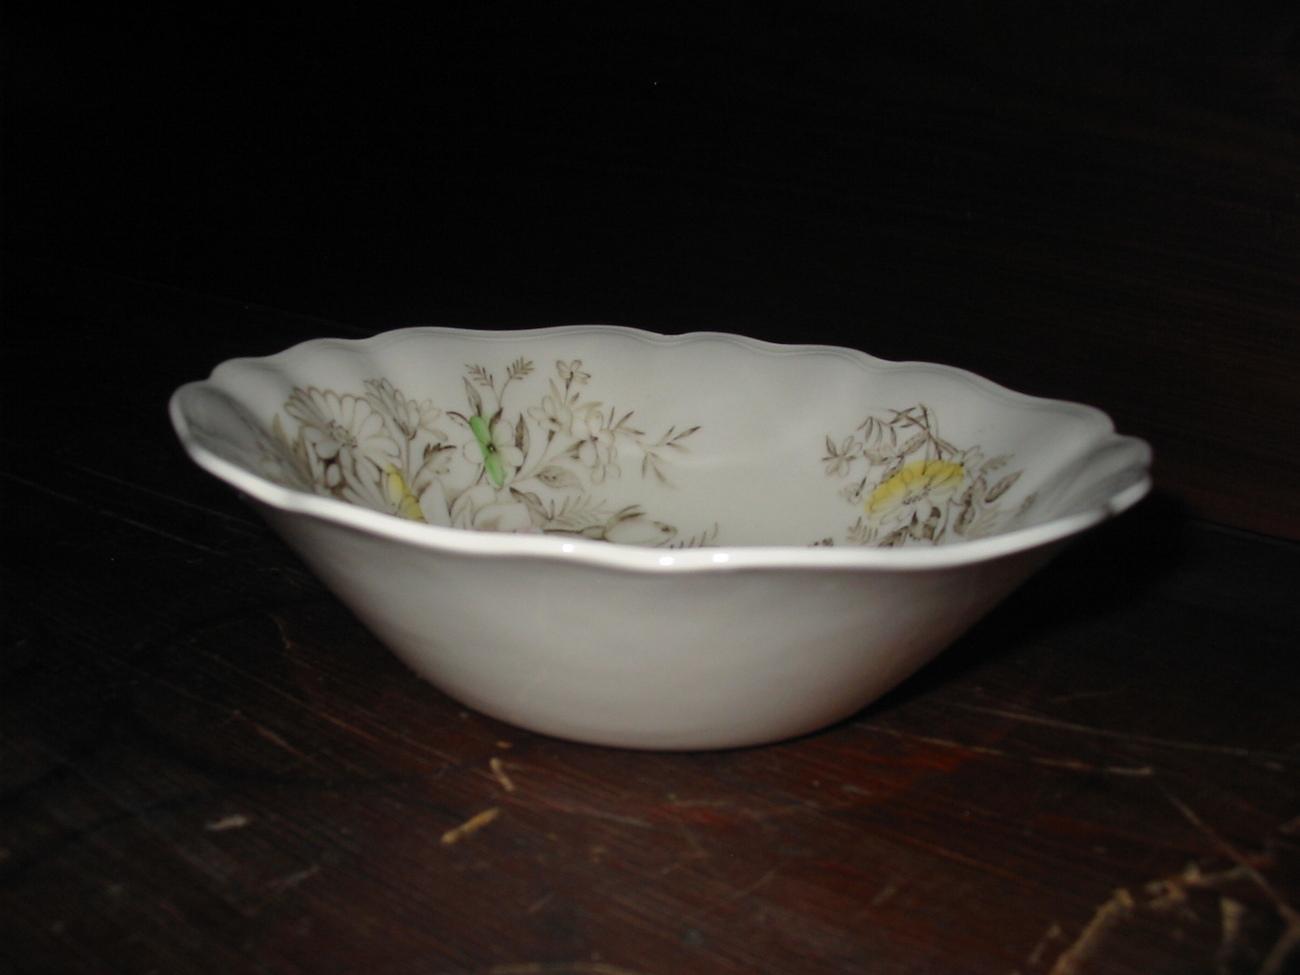 English Staffordshire Devonshire Soup/Fruit Bowl - $3.00